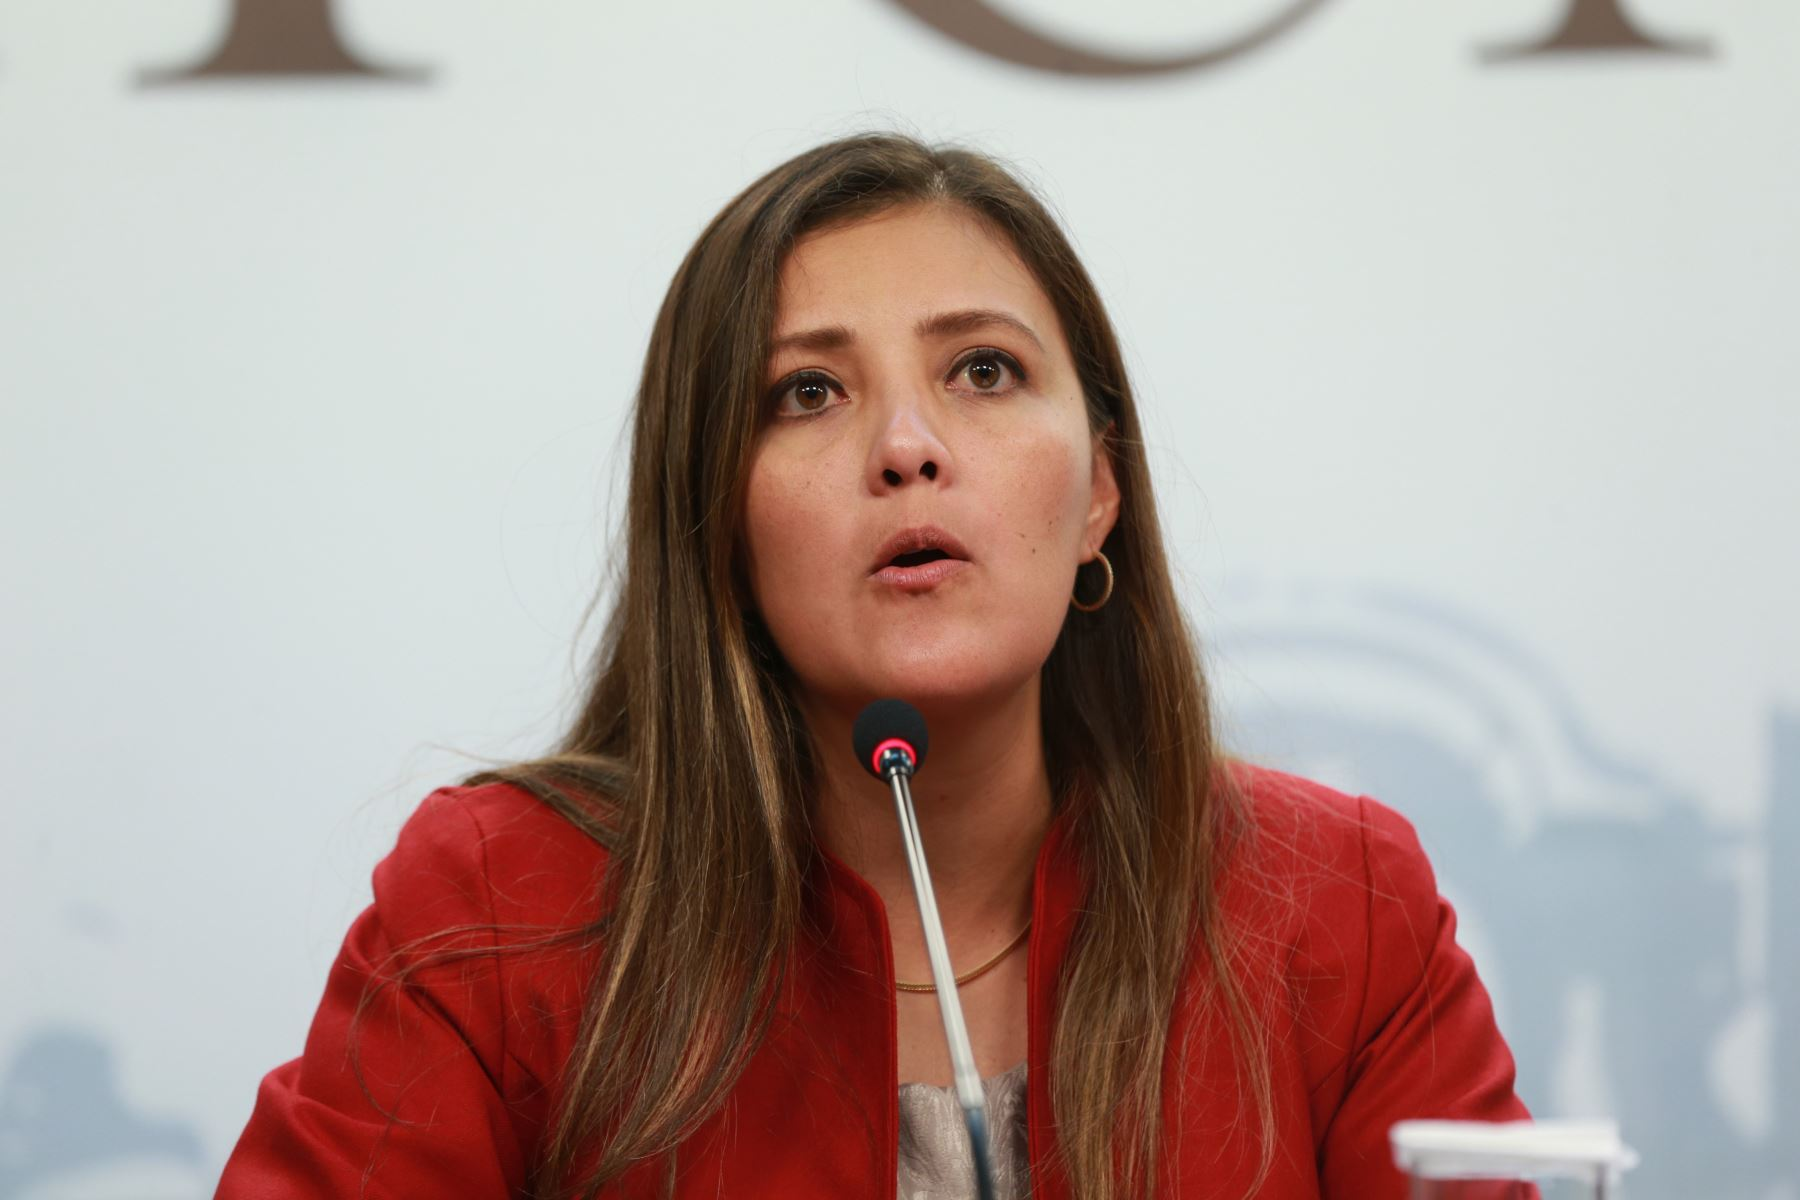 Gobernadora regional de Arequipa, Yamila Osorio. ANDINA/Dante Zegarra